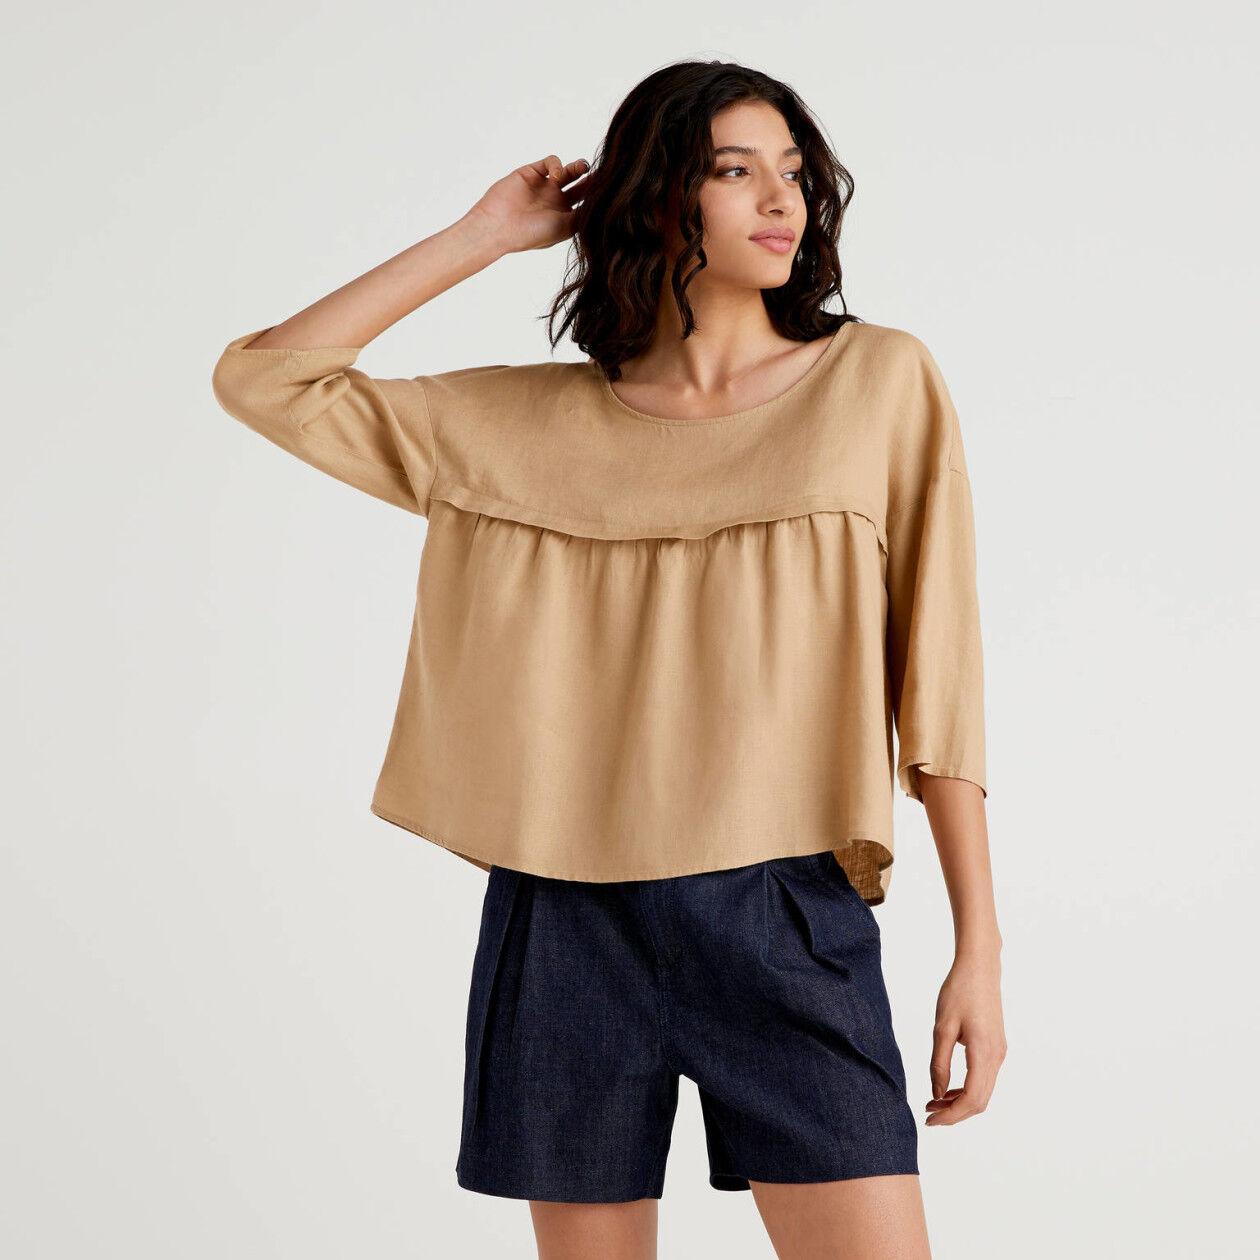 Blusa de 100% lino con volante